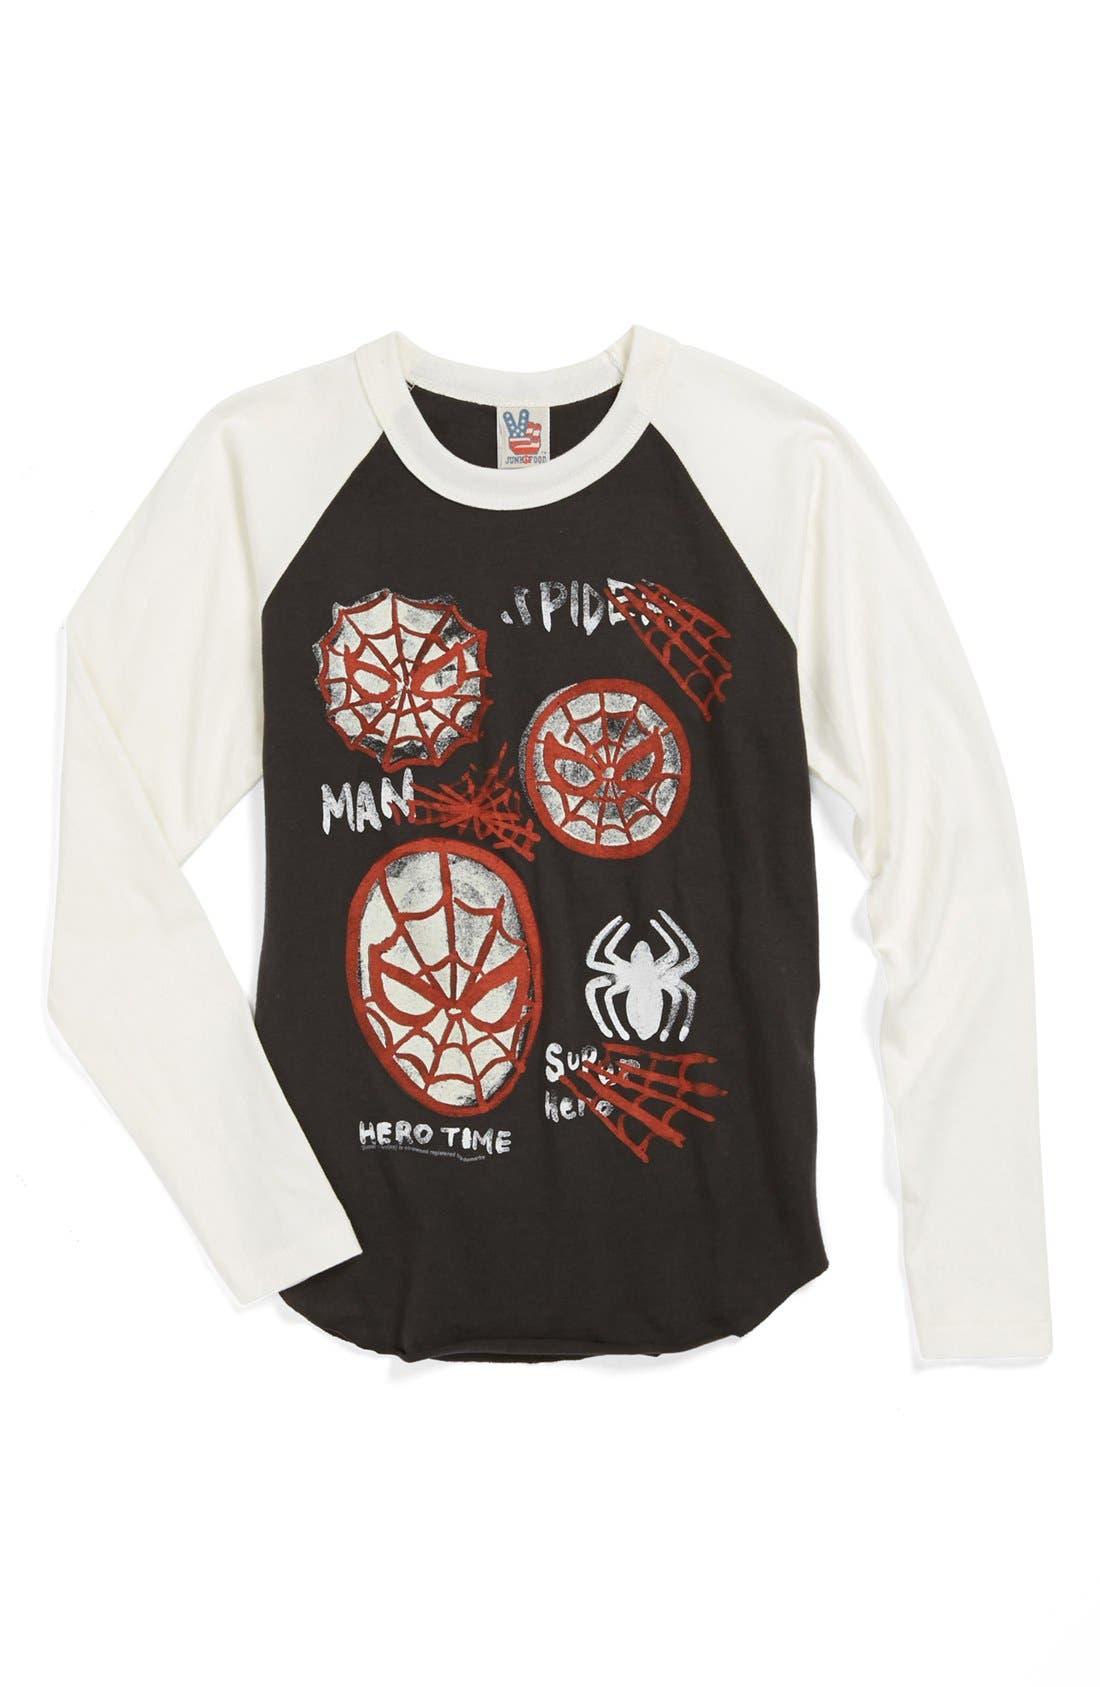 Alternate Image 1 Selected - Junk Food 'Spider-Man' Baseball T-Shirt (Little Boys & Big Boys)